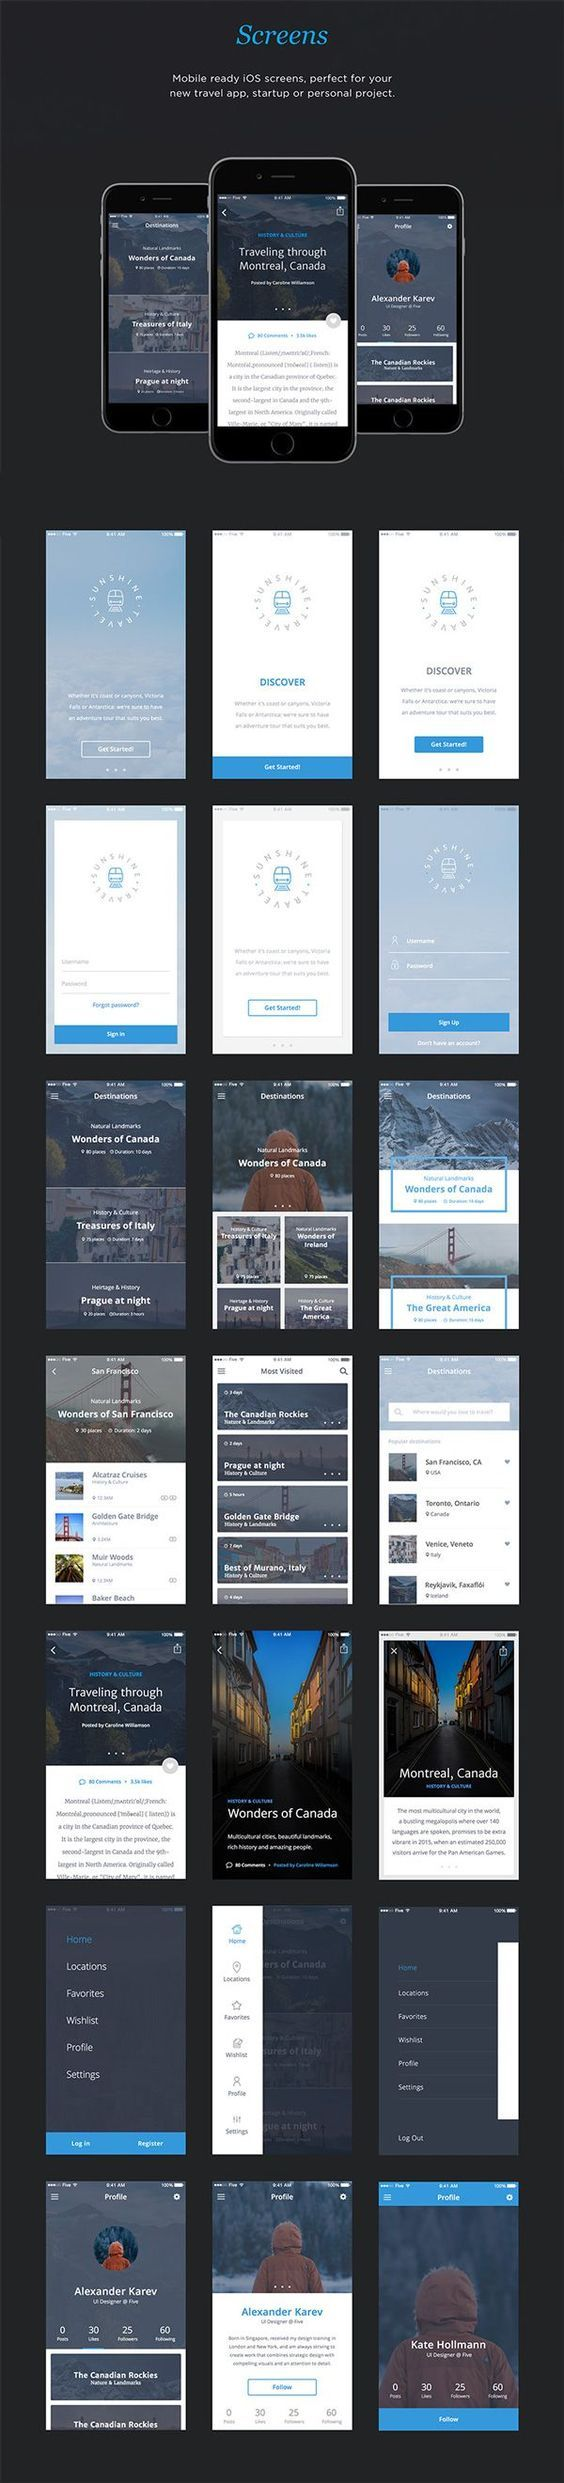 Free Download : Travel App UI Kit (50 screens):